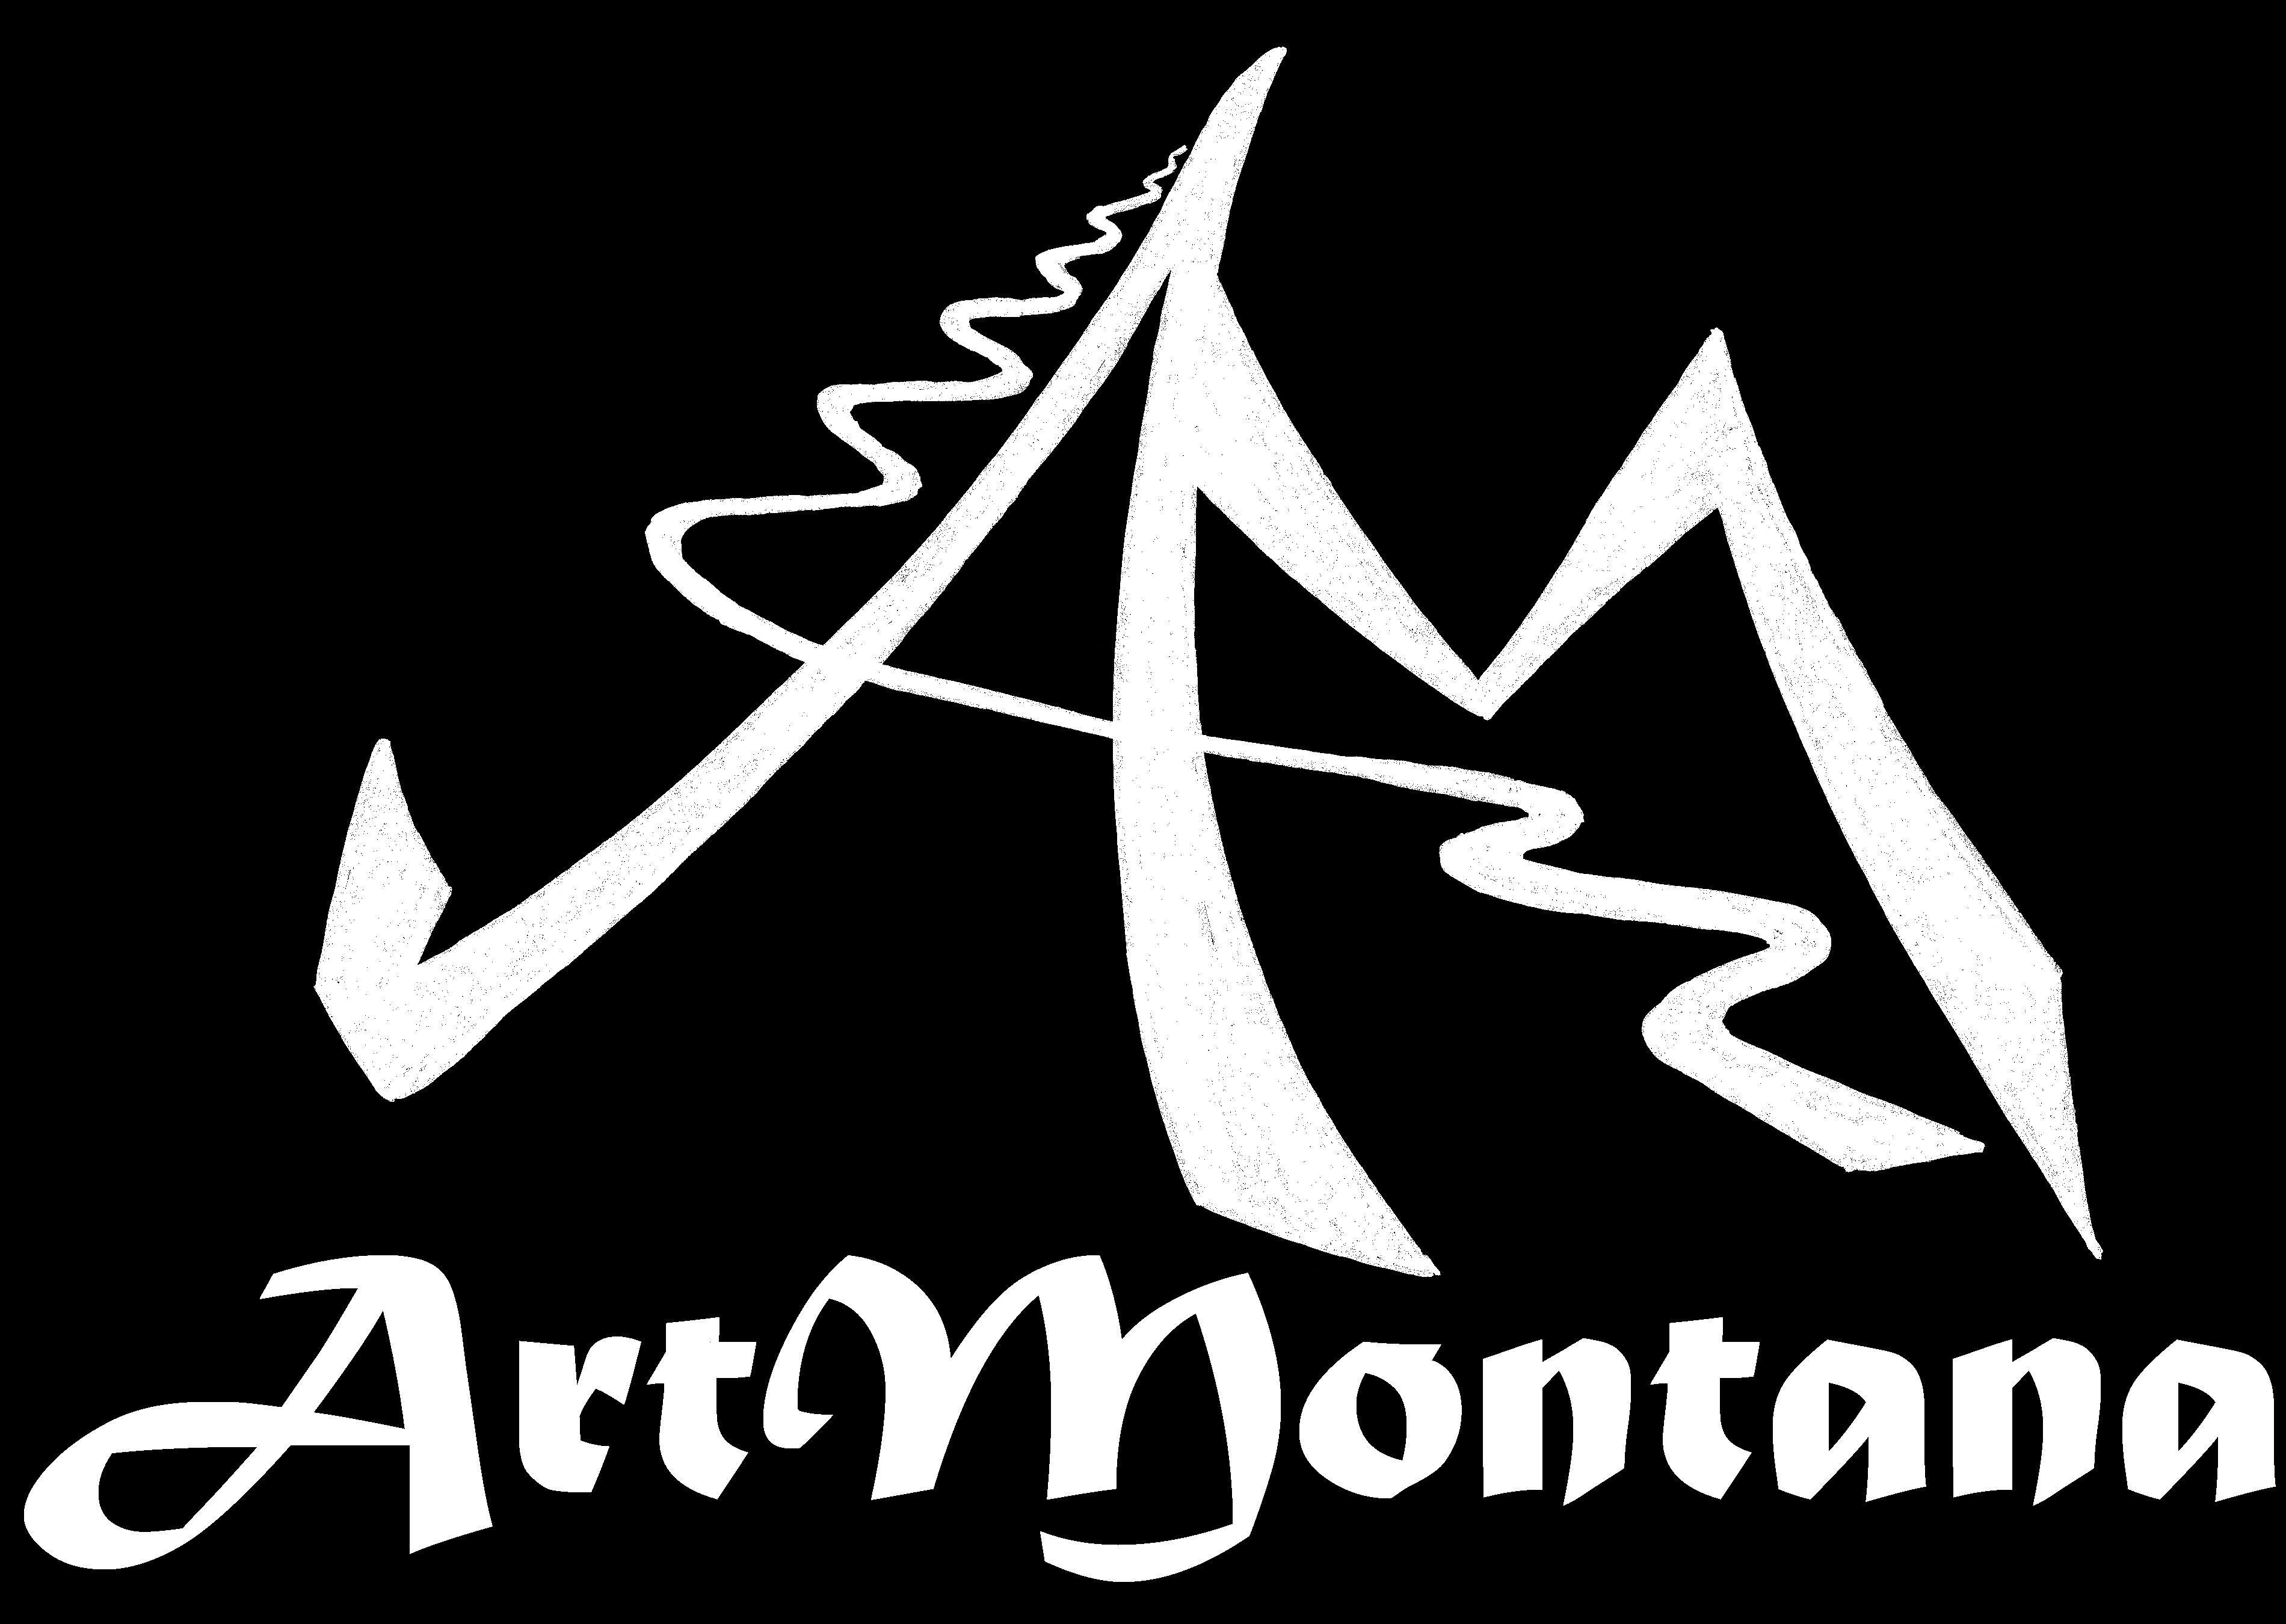 ArtMontana